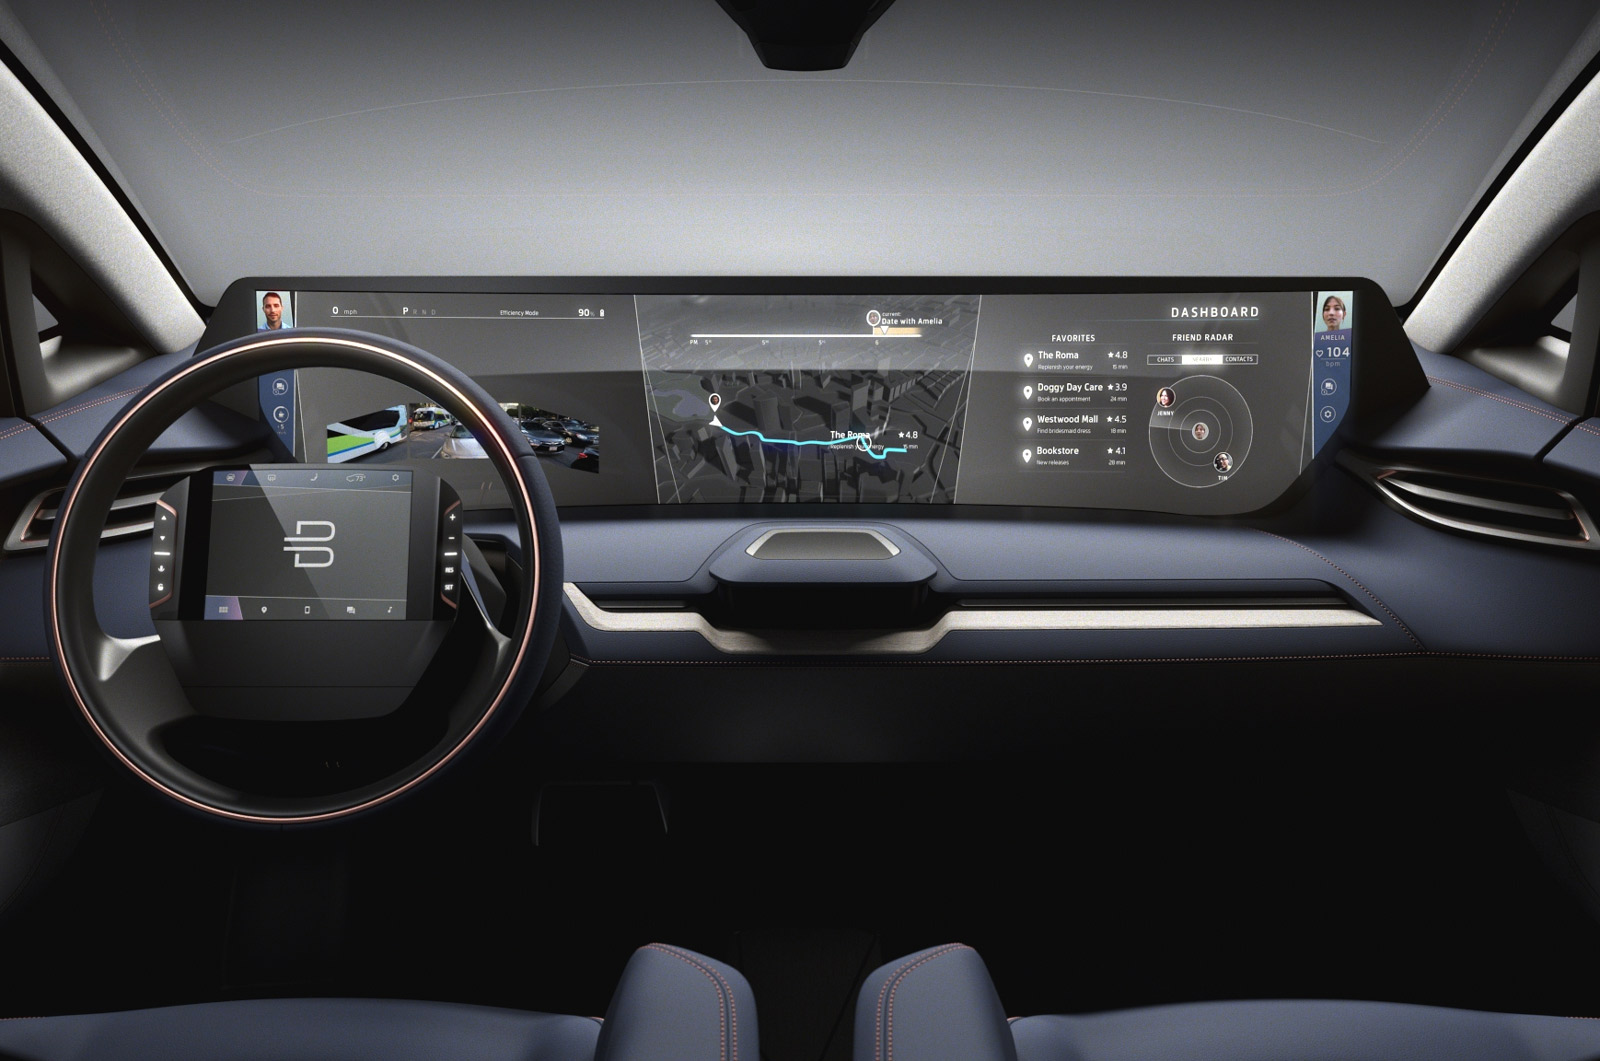 Byton onthult elektrische auto met 49-inch touchscreen - Technieuws